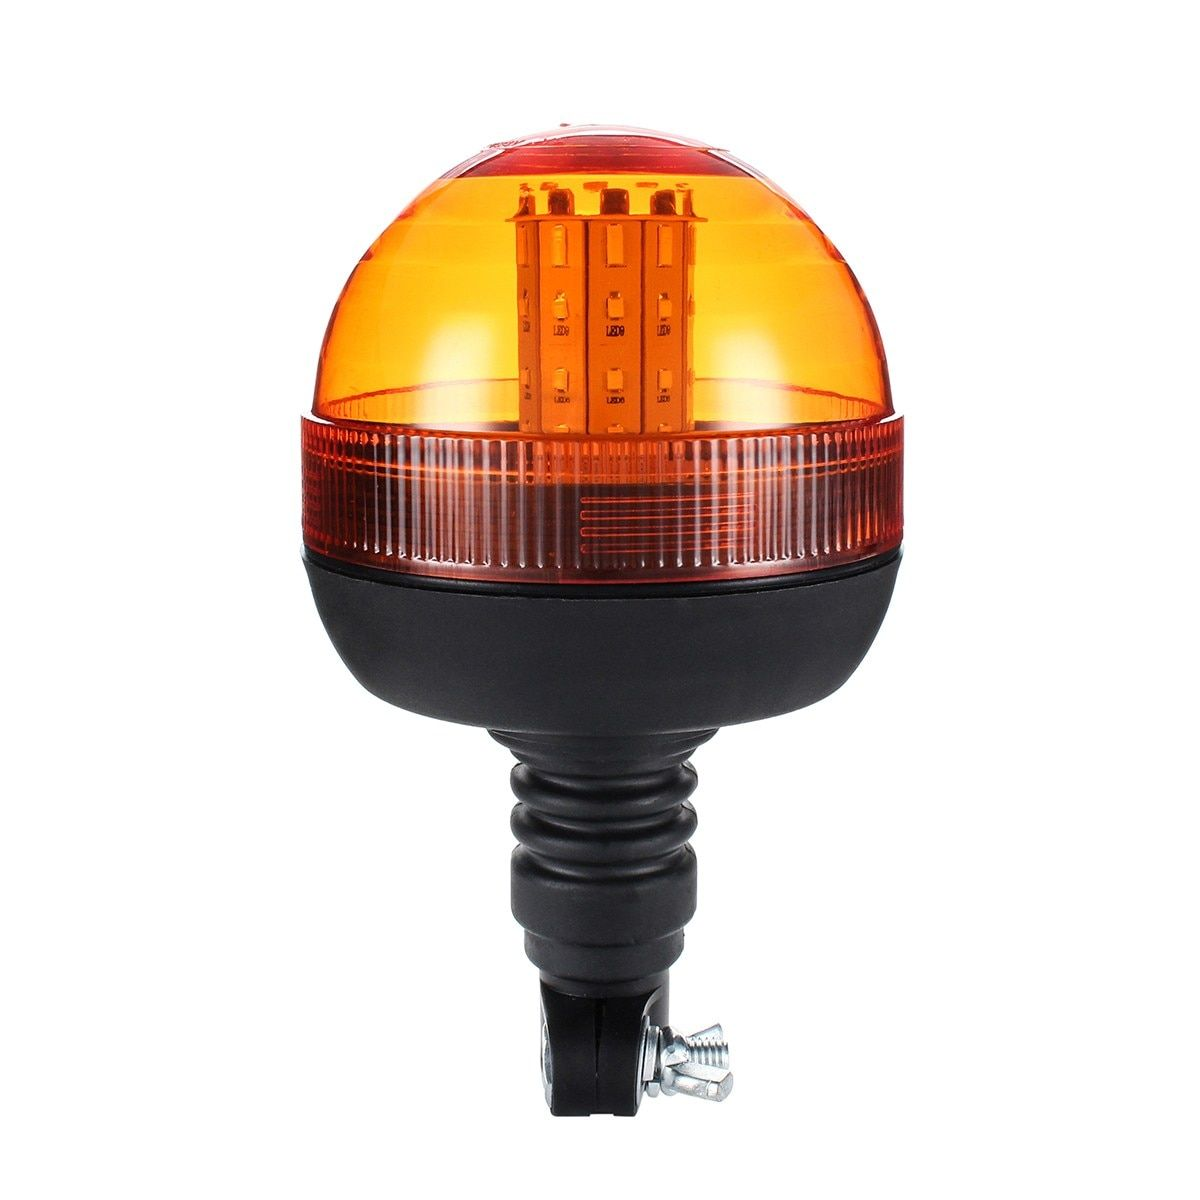 Safurance LED Rotating Flashing Amber Beacon Flexible Tractor Warning Light 12V-24V Roadway Safety